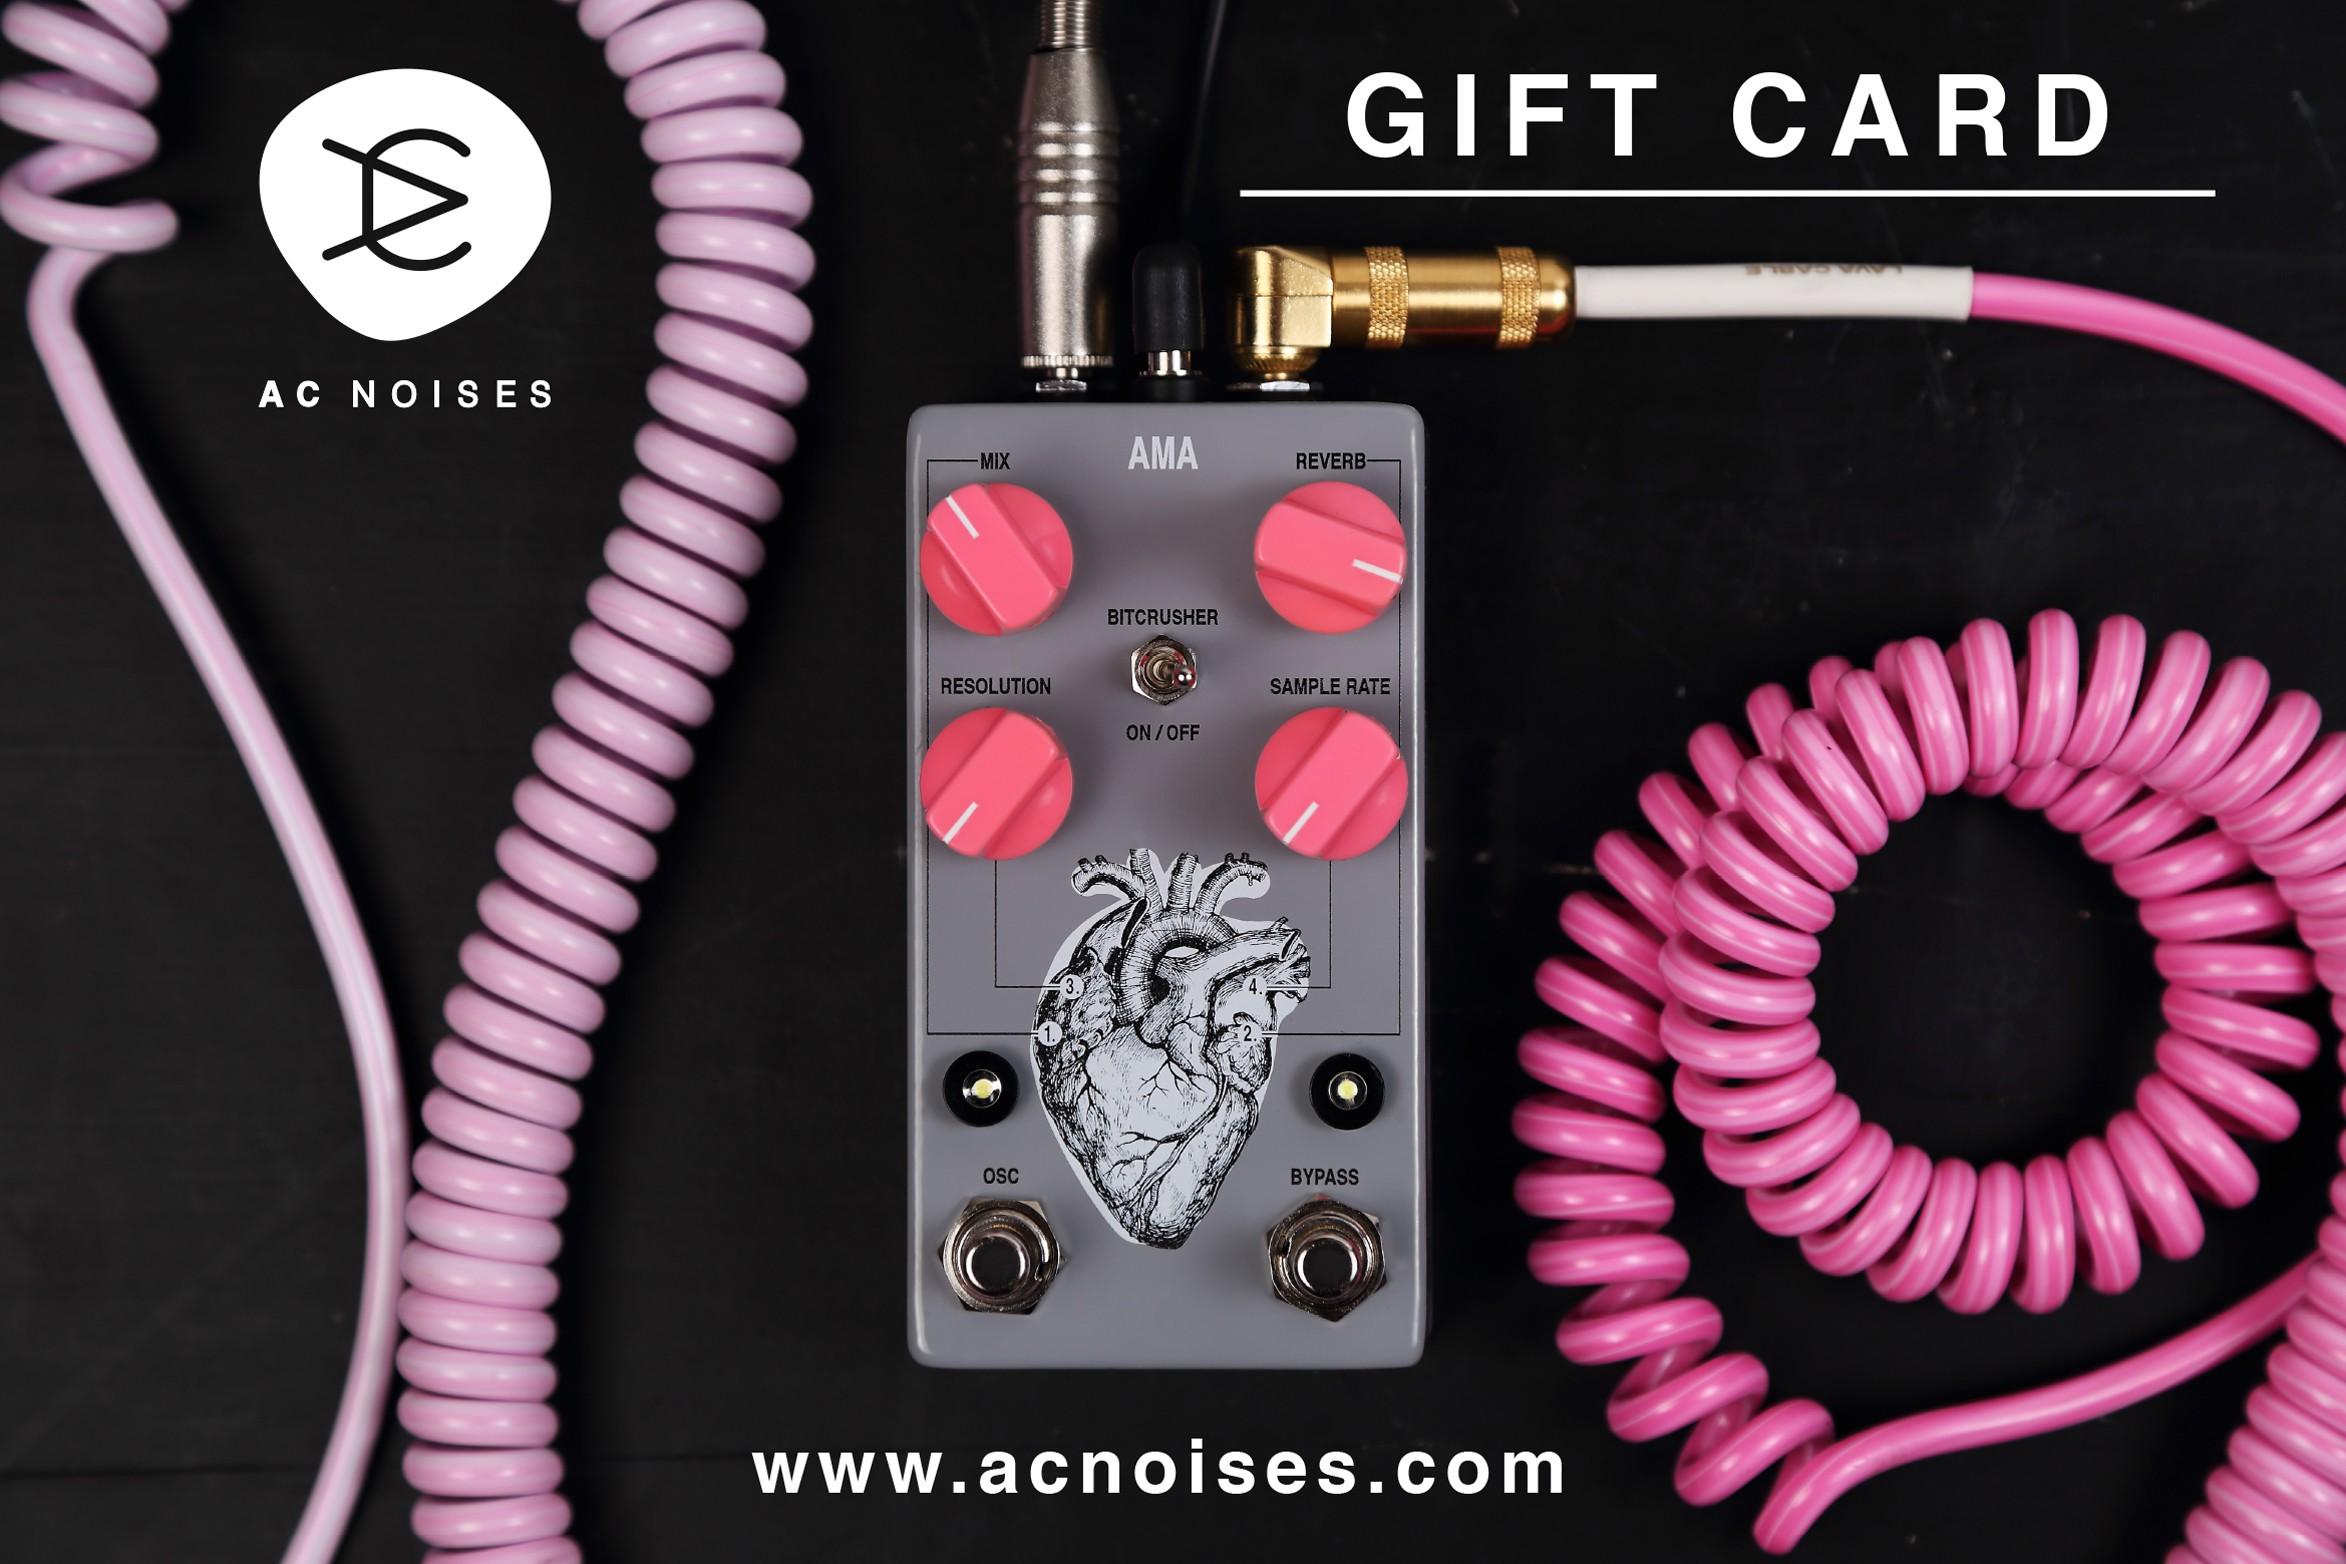 AC noises Gift Card